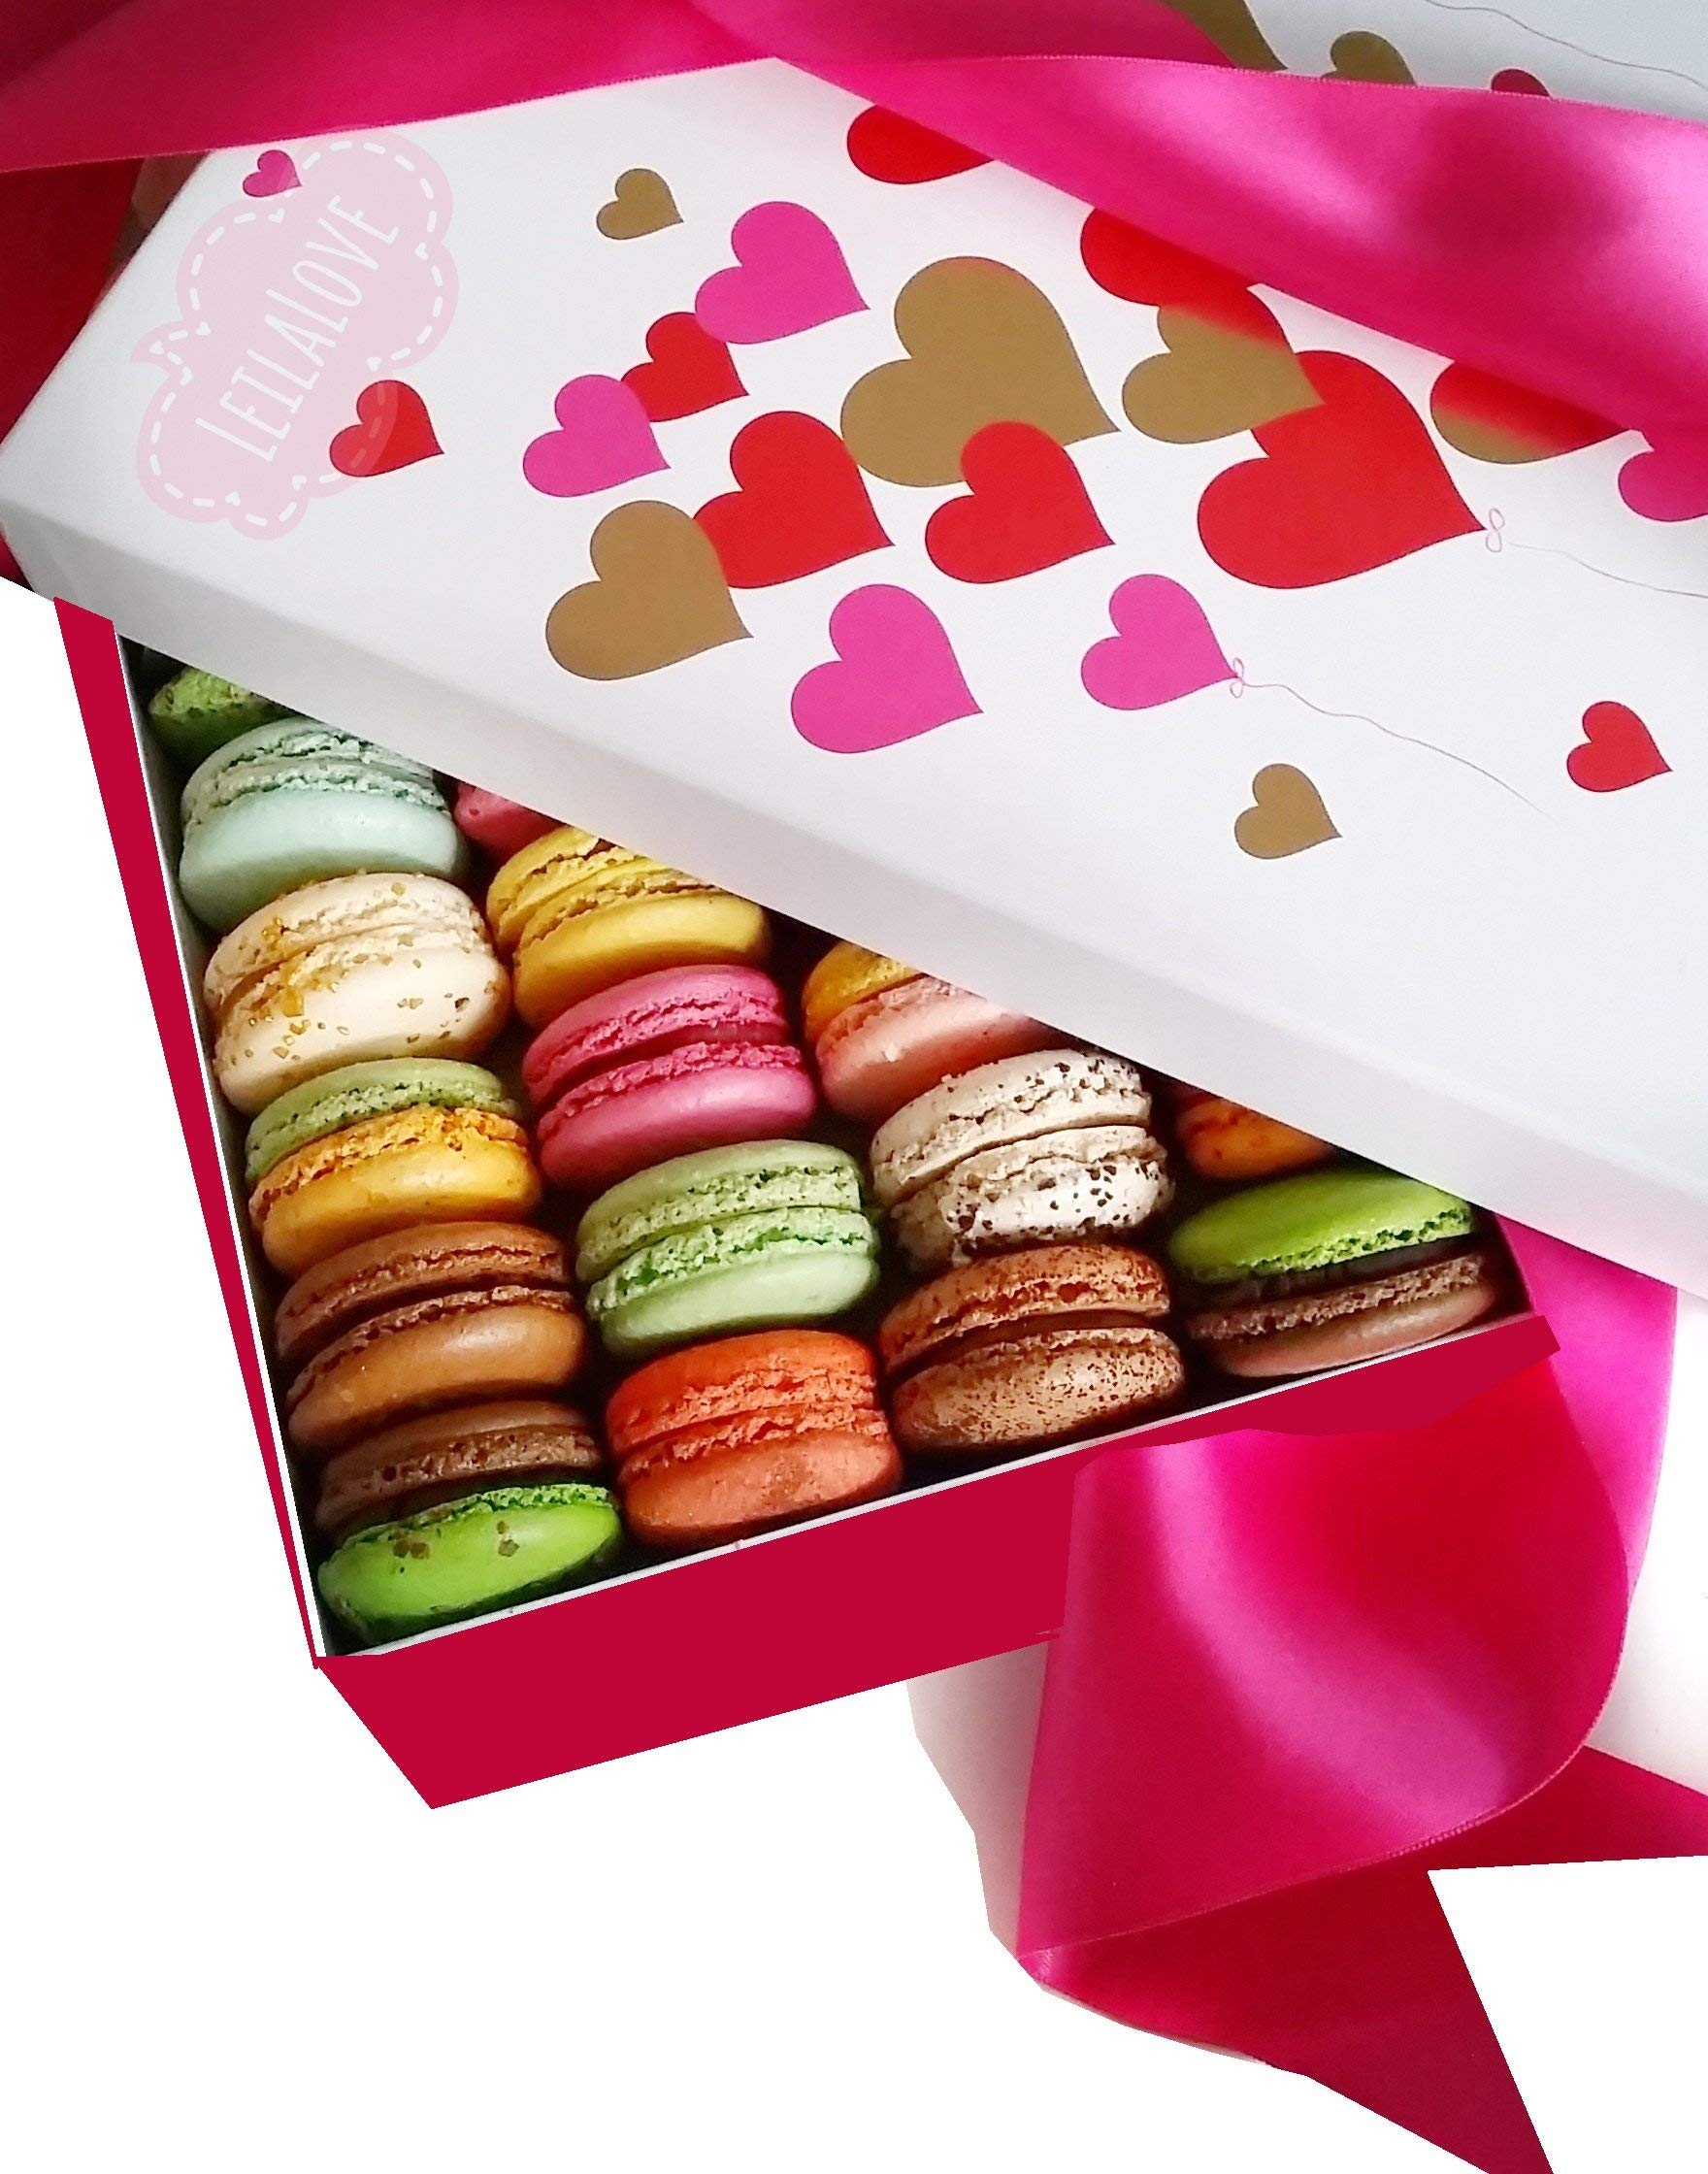 LeilaLove Macarons 21 Gourmet Macarons - Freshly baked to order - Love in Paris box by LeilaLove,Inc (Image #1)